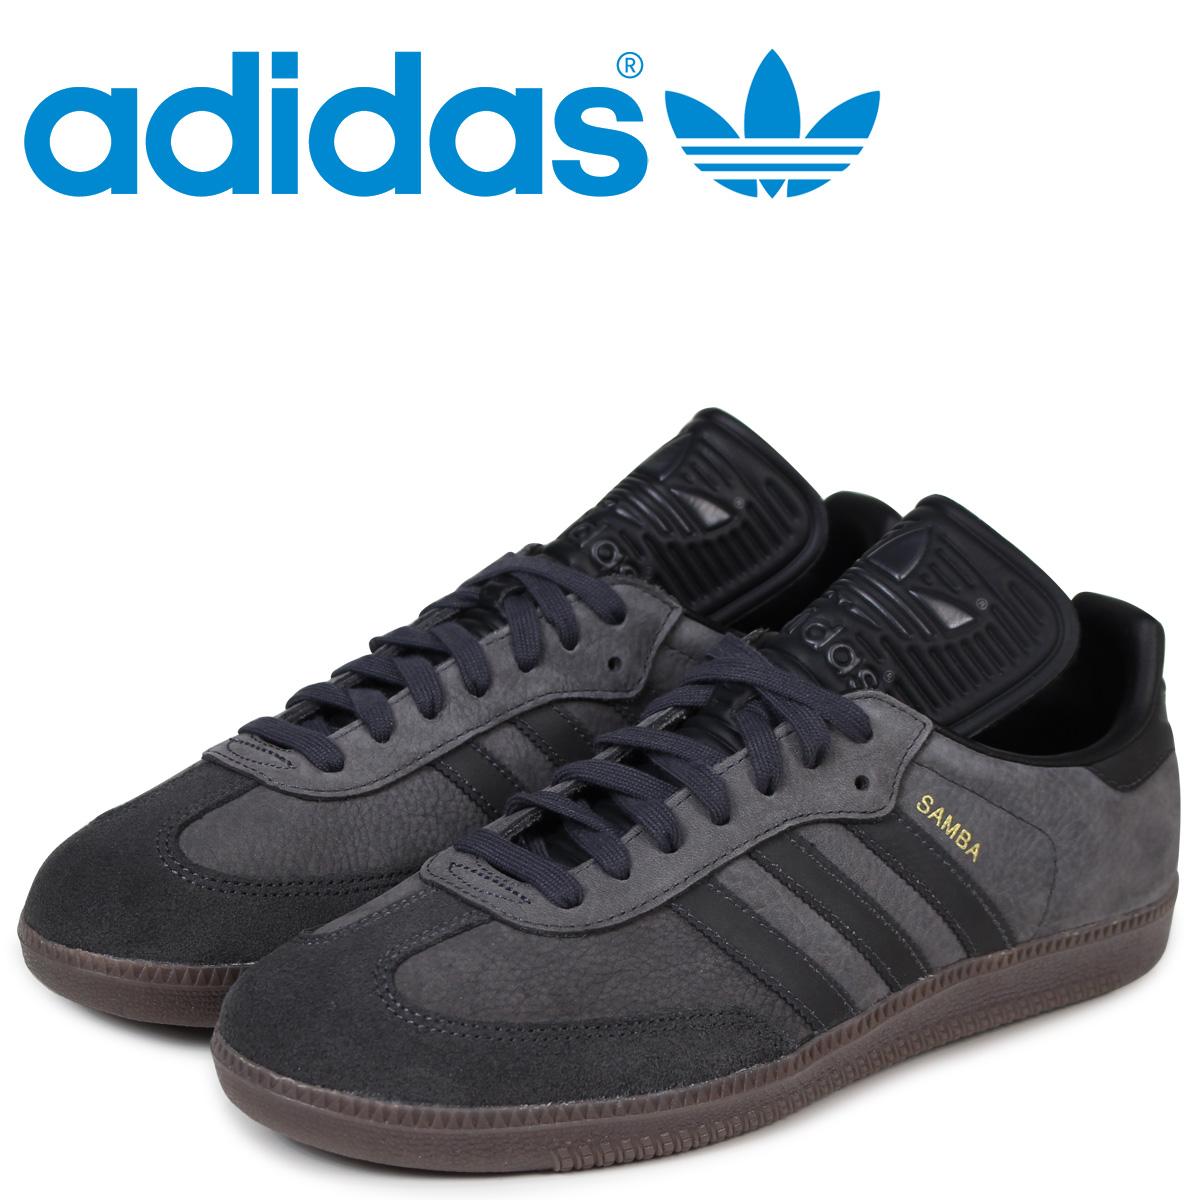 adidas Originals サンバ アディダス スニーカー SAMBA CLASSIC OG メンズ BZ0227 ブラック オリジナルス